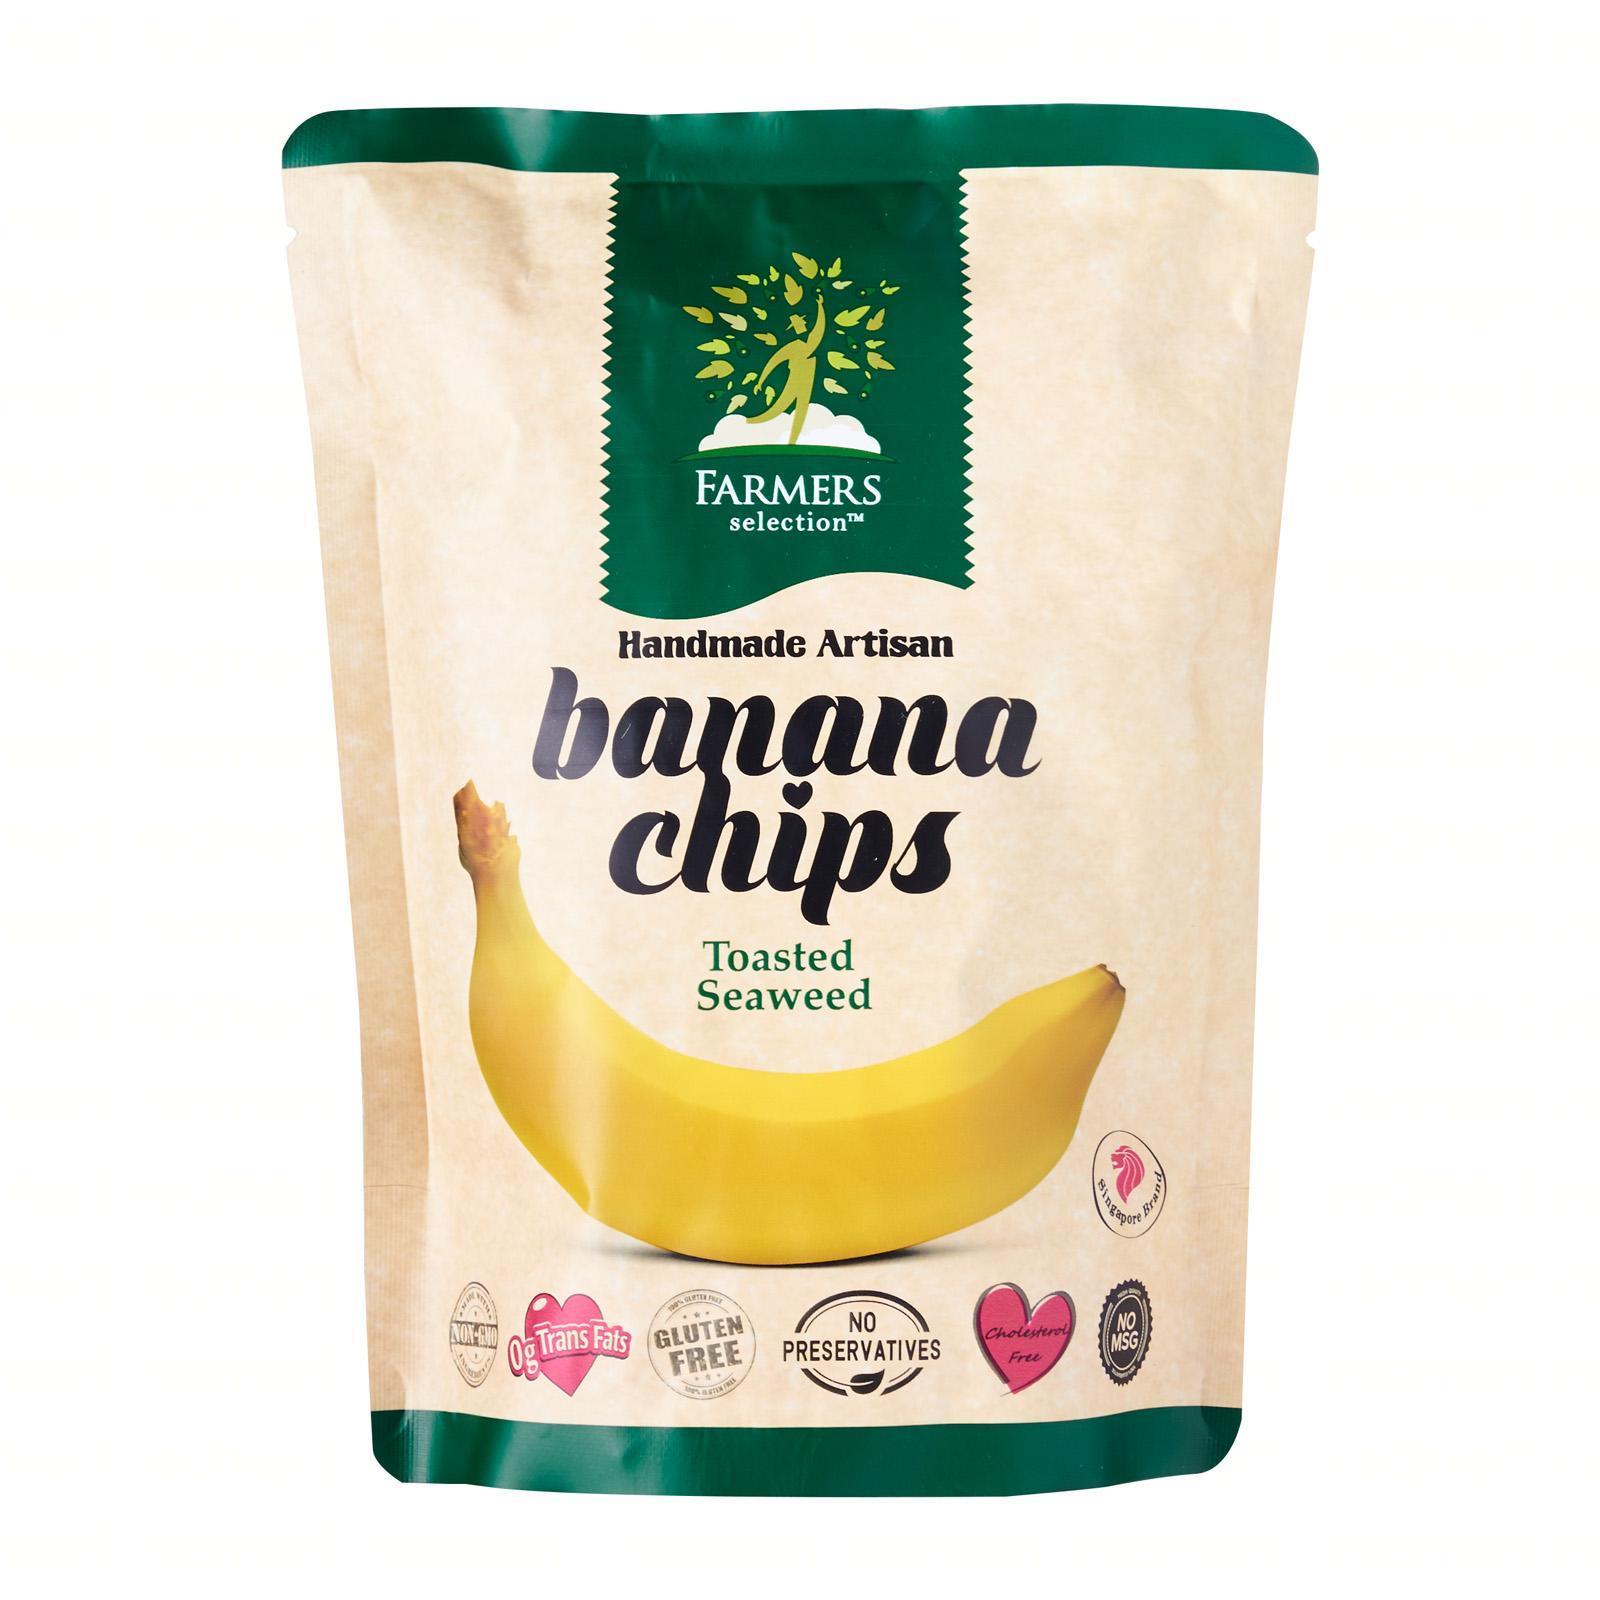 Farmers Selection Toasted Seaweed Banana Chips